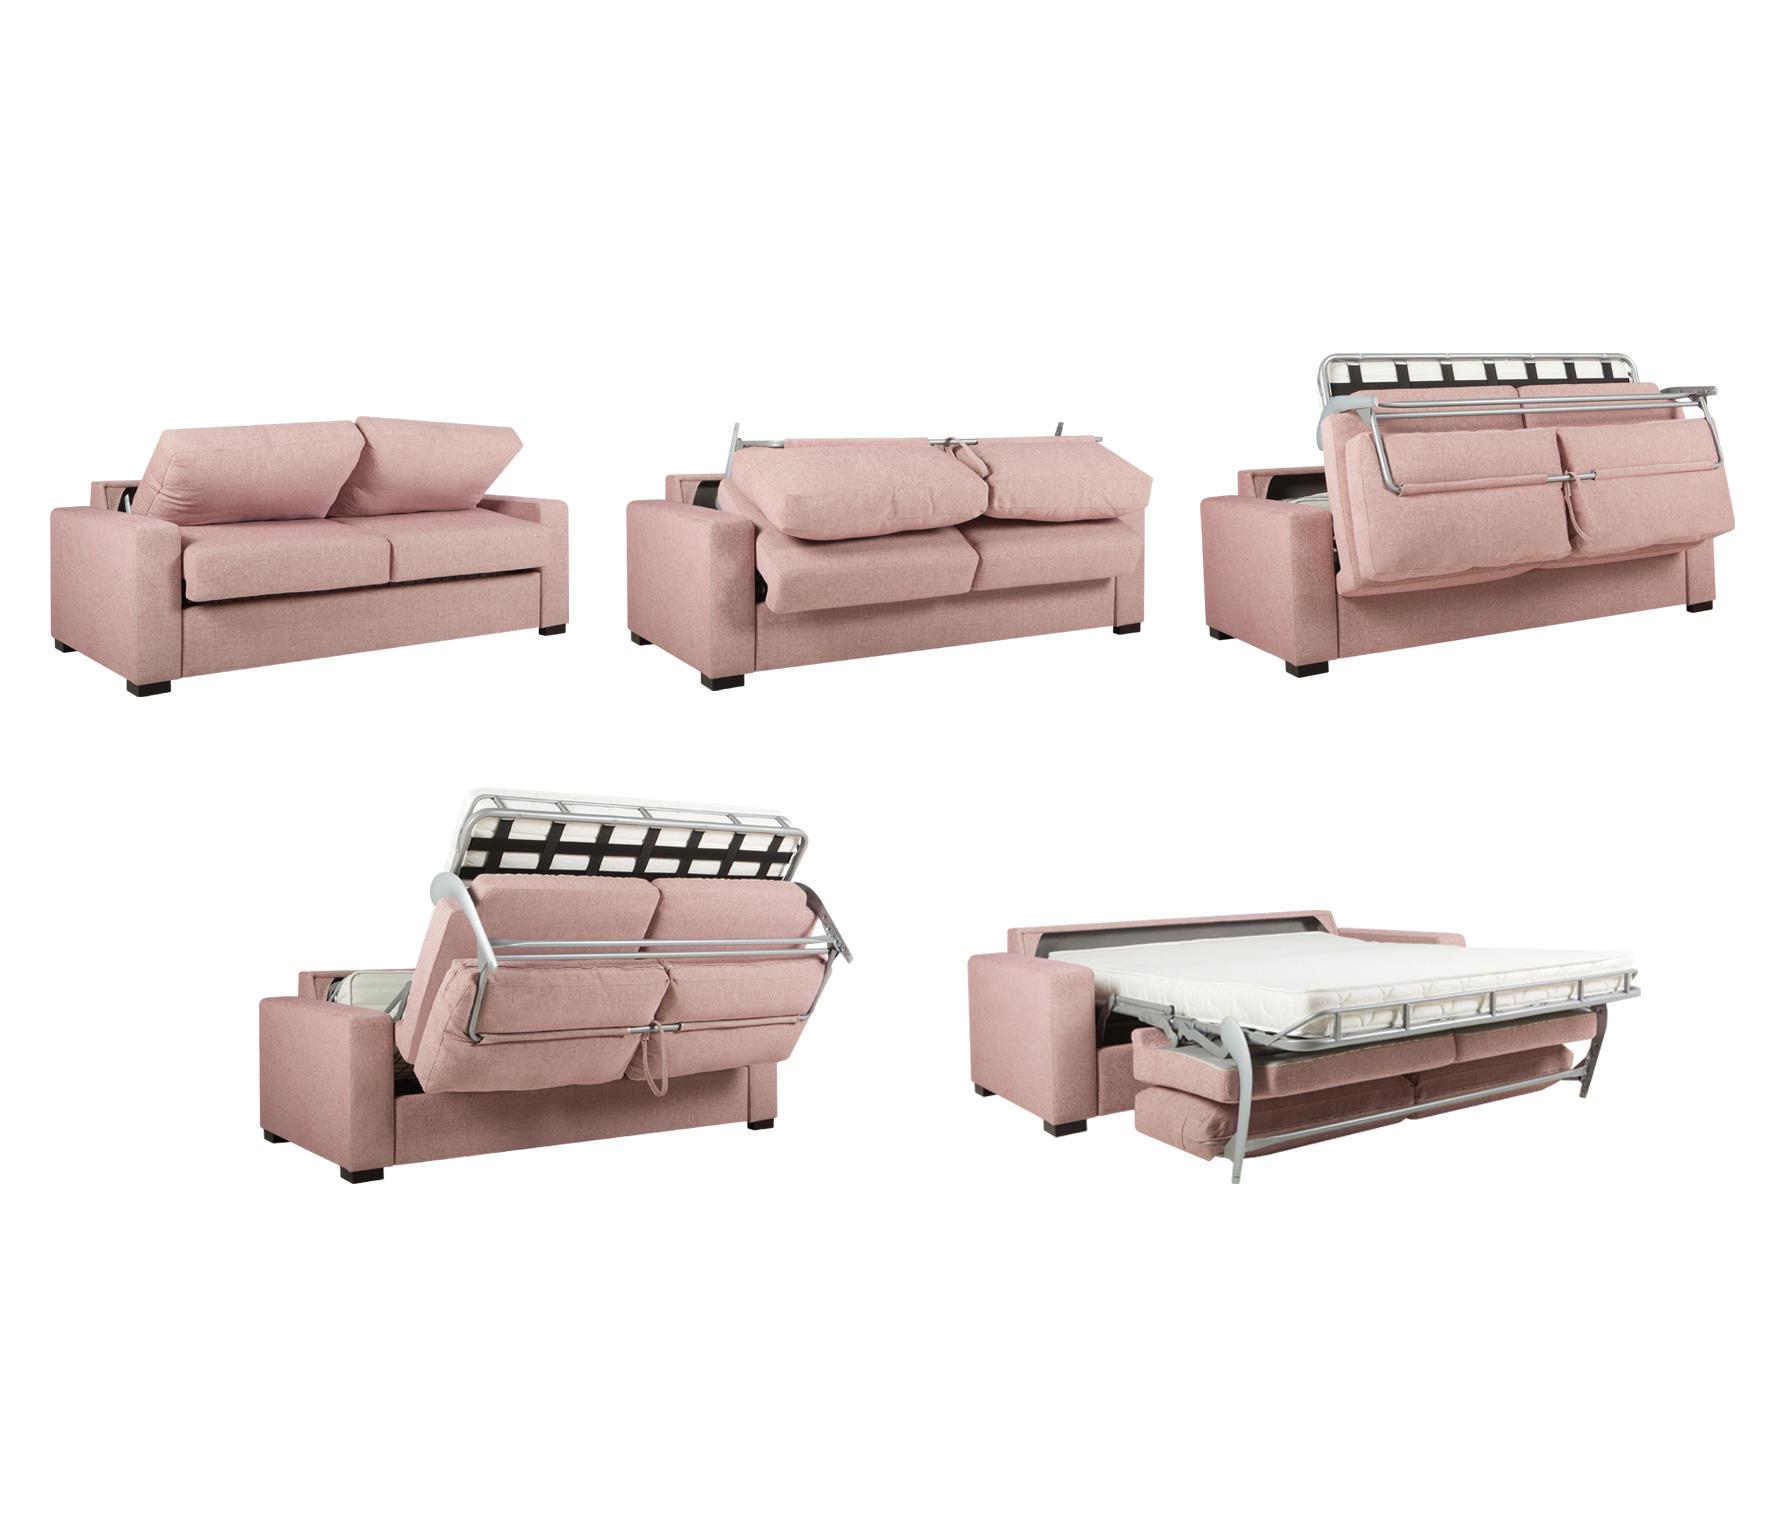 lukas sofas von sits architonic. Black Bedroom Furniture Sets. Home Design Ideas